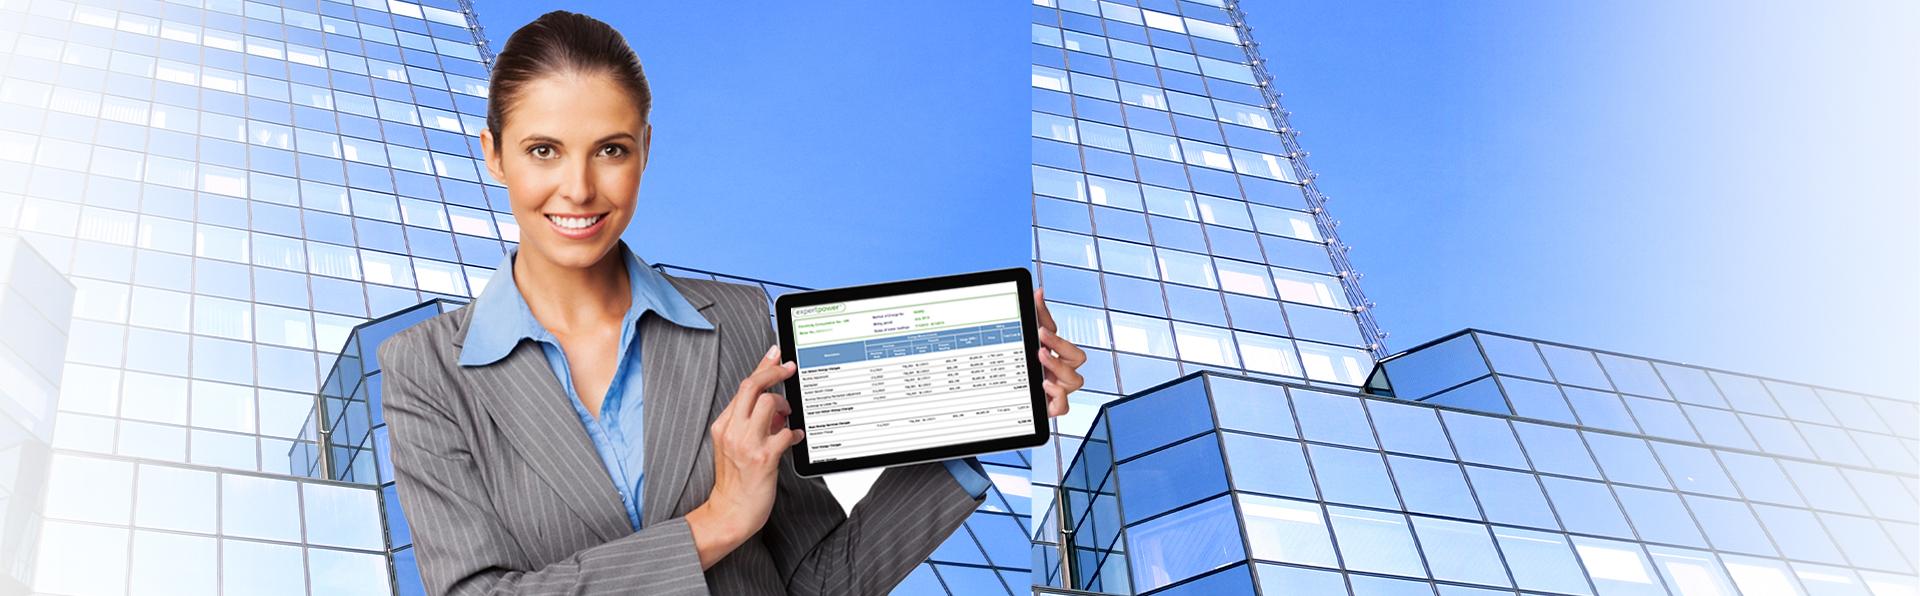 Energy billing for sub-tenant management